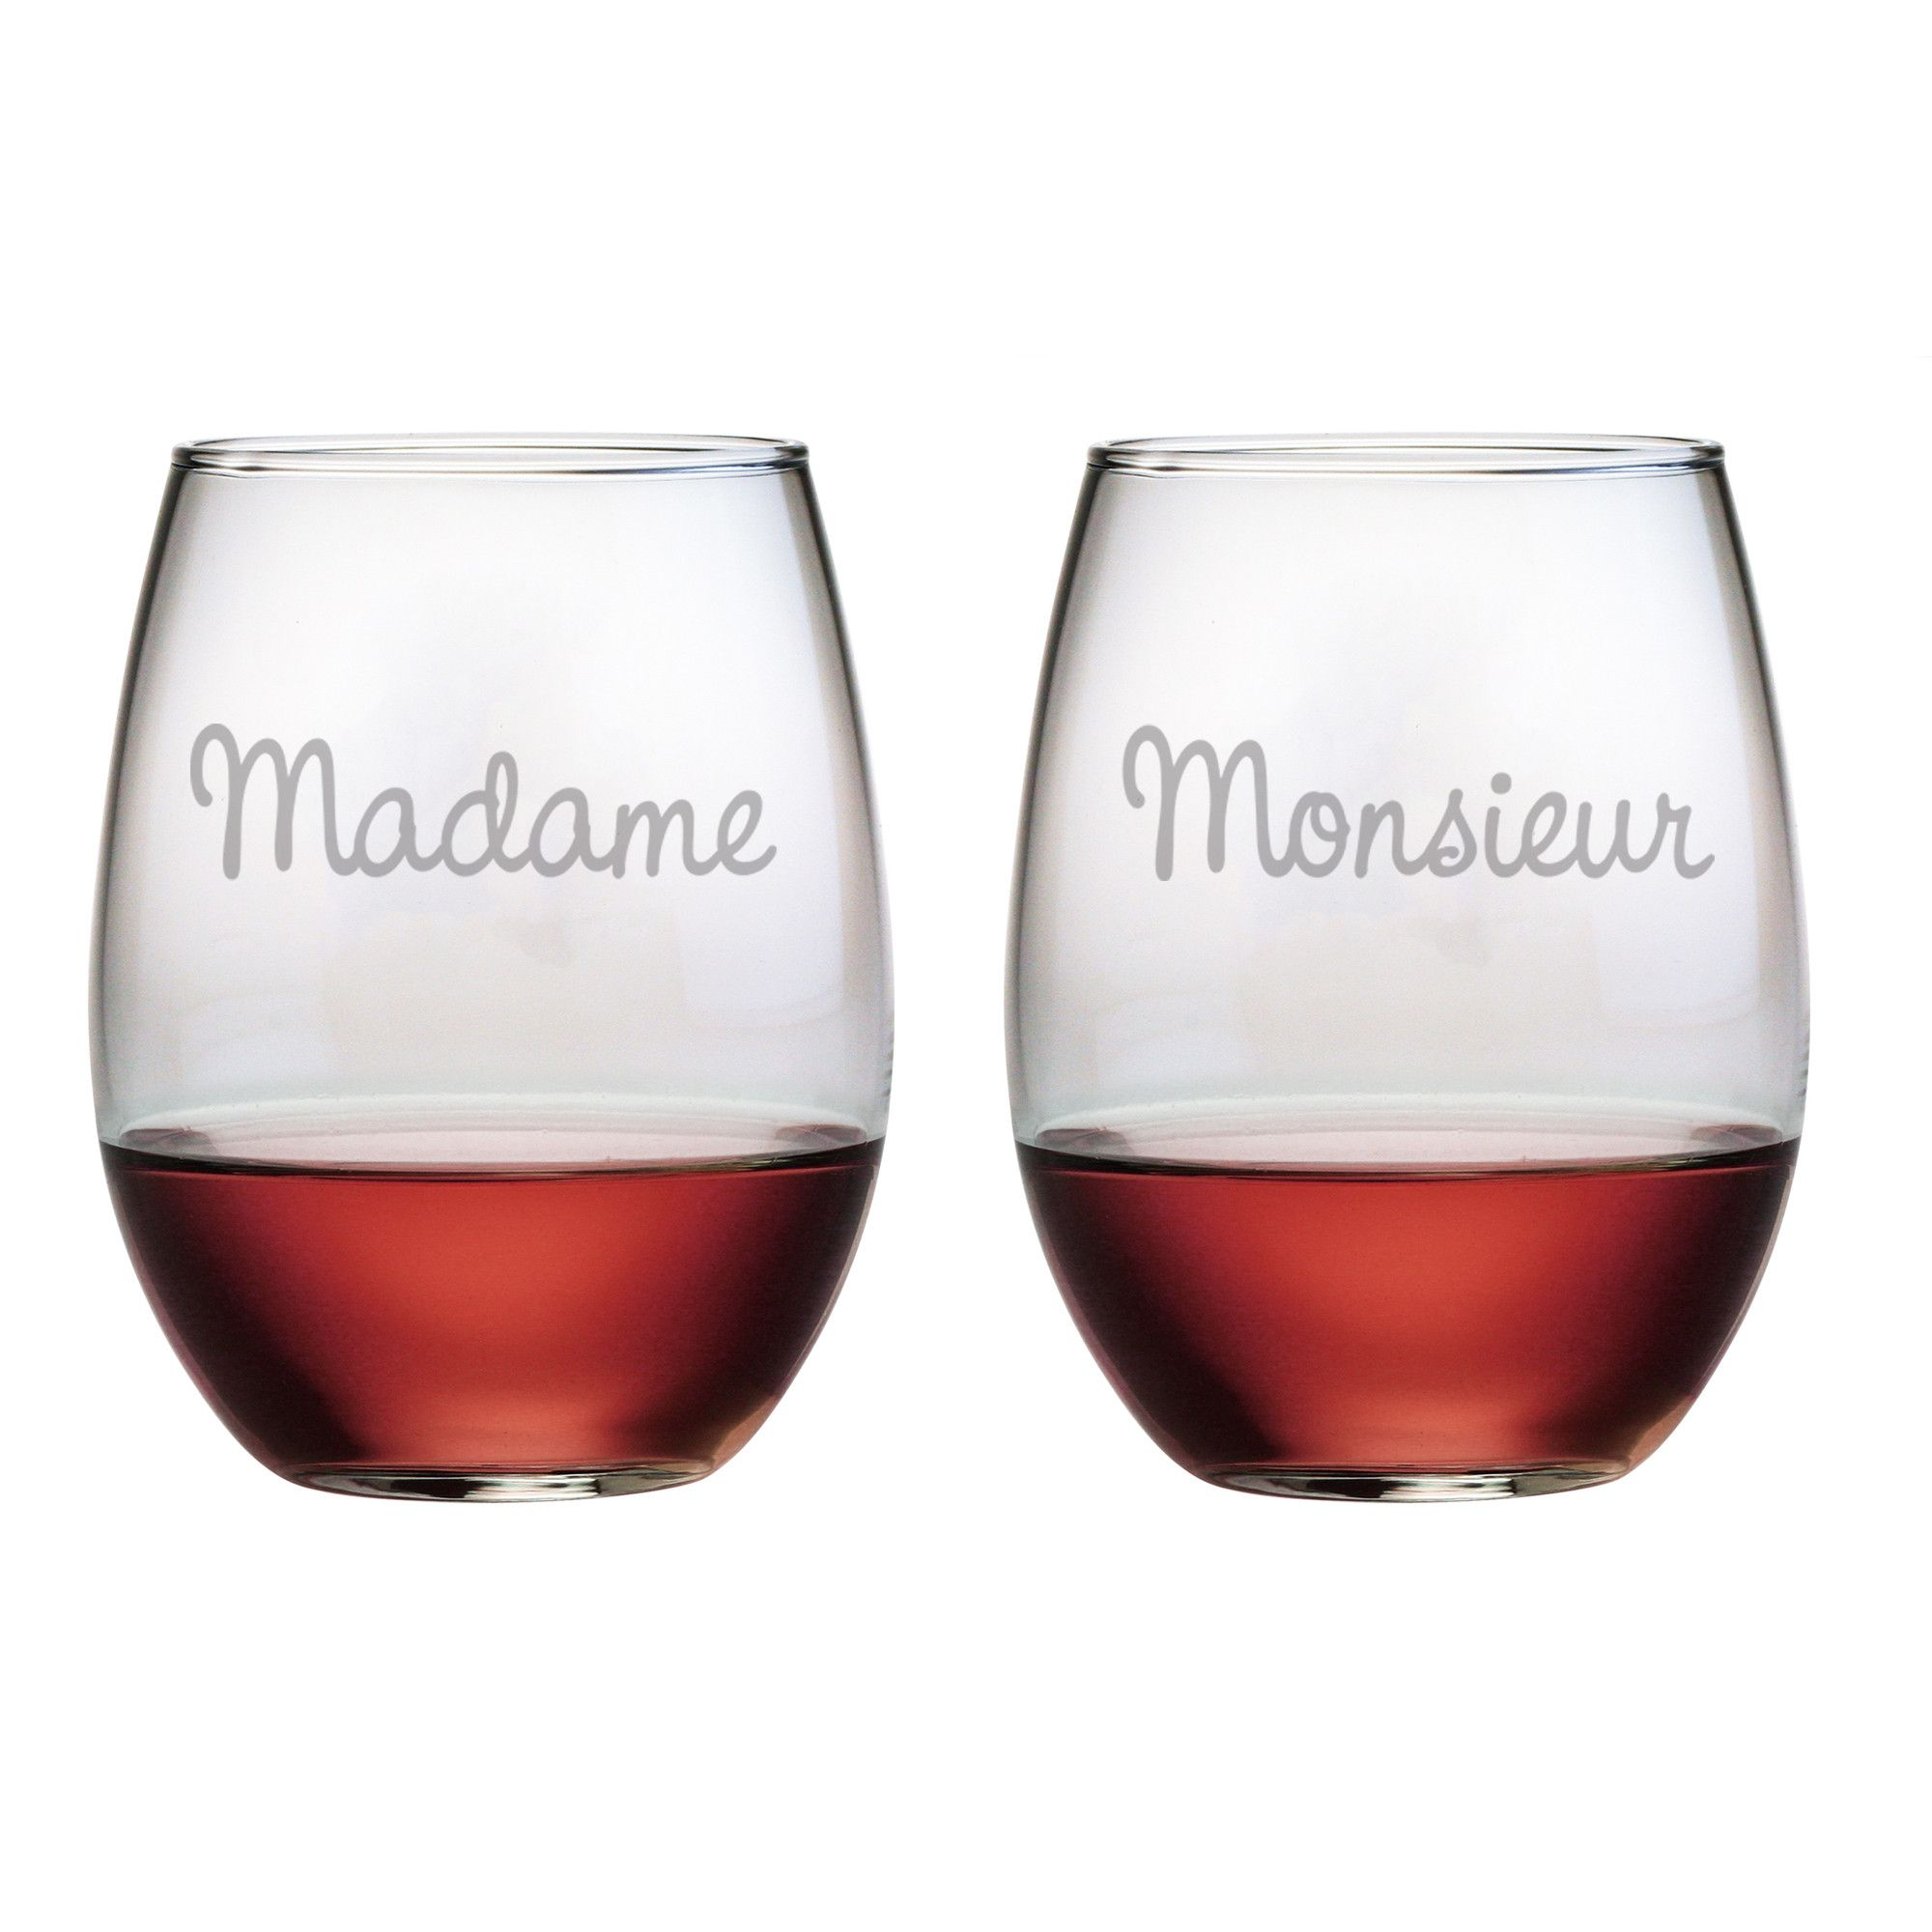 Madame Monsieur Stemless Wine Glasses Wine Glass Stemless Wine Glass Wine Glass Set